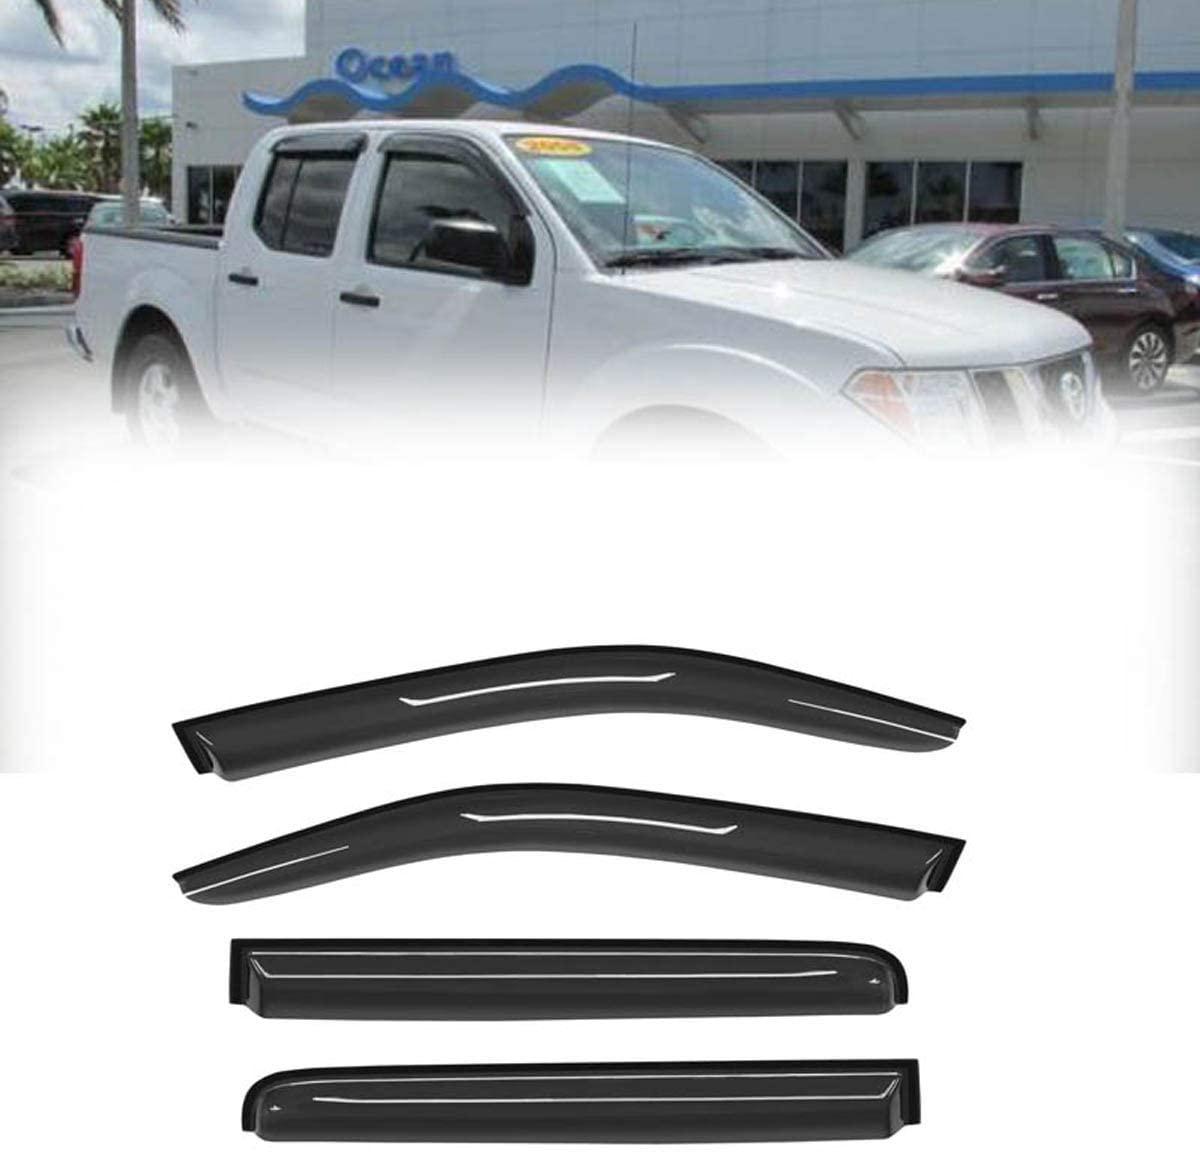 Laprive Auto 4pcs for 05-16 Nissan Frontier Crew Cab Sun Rain Guard Vent Shade Window Visors